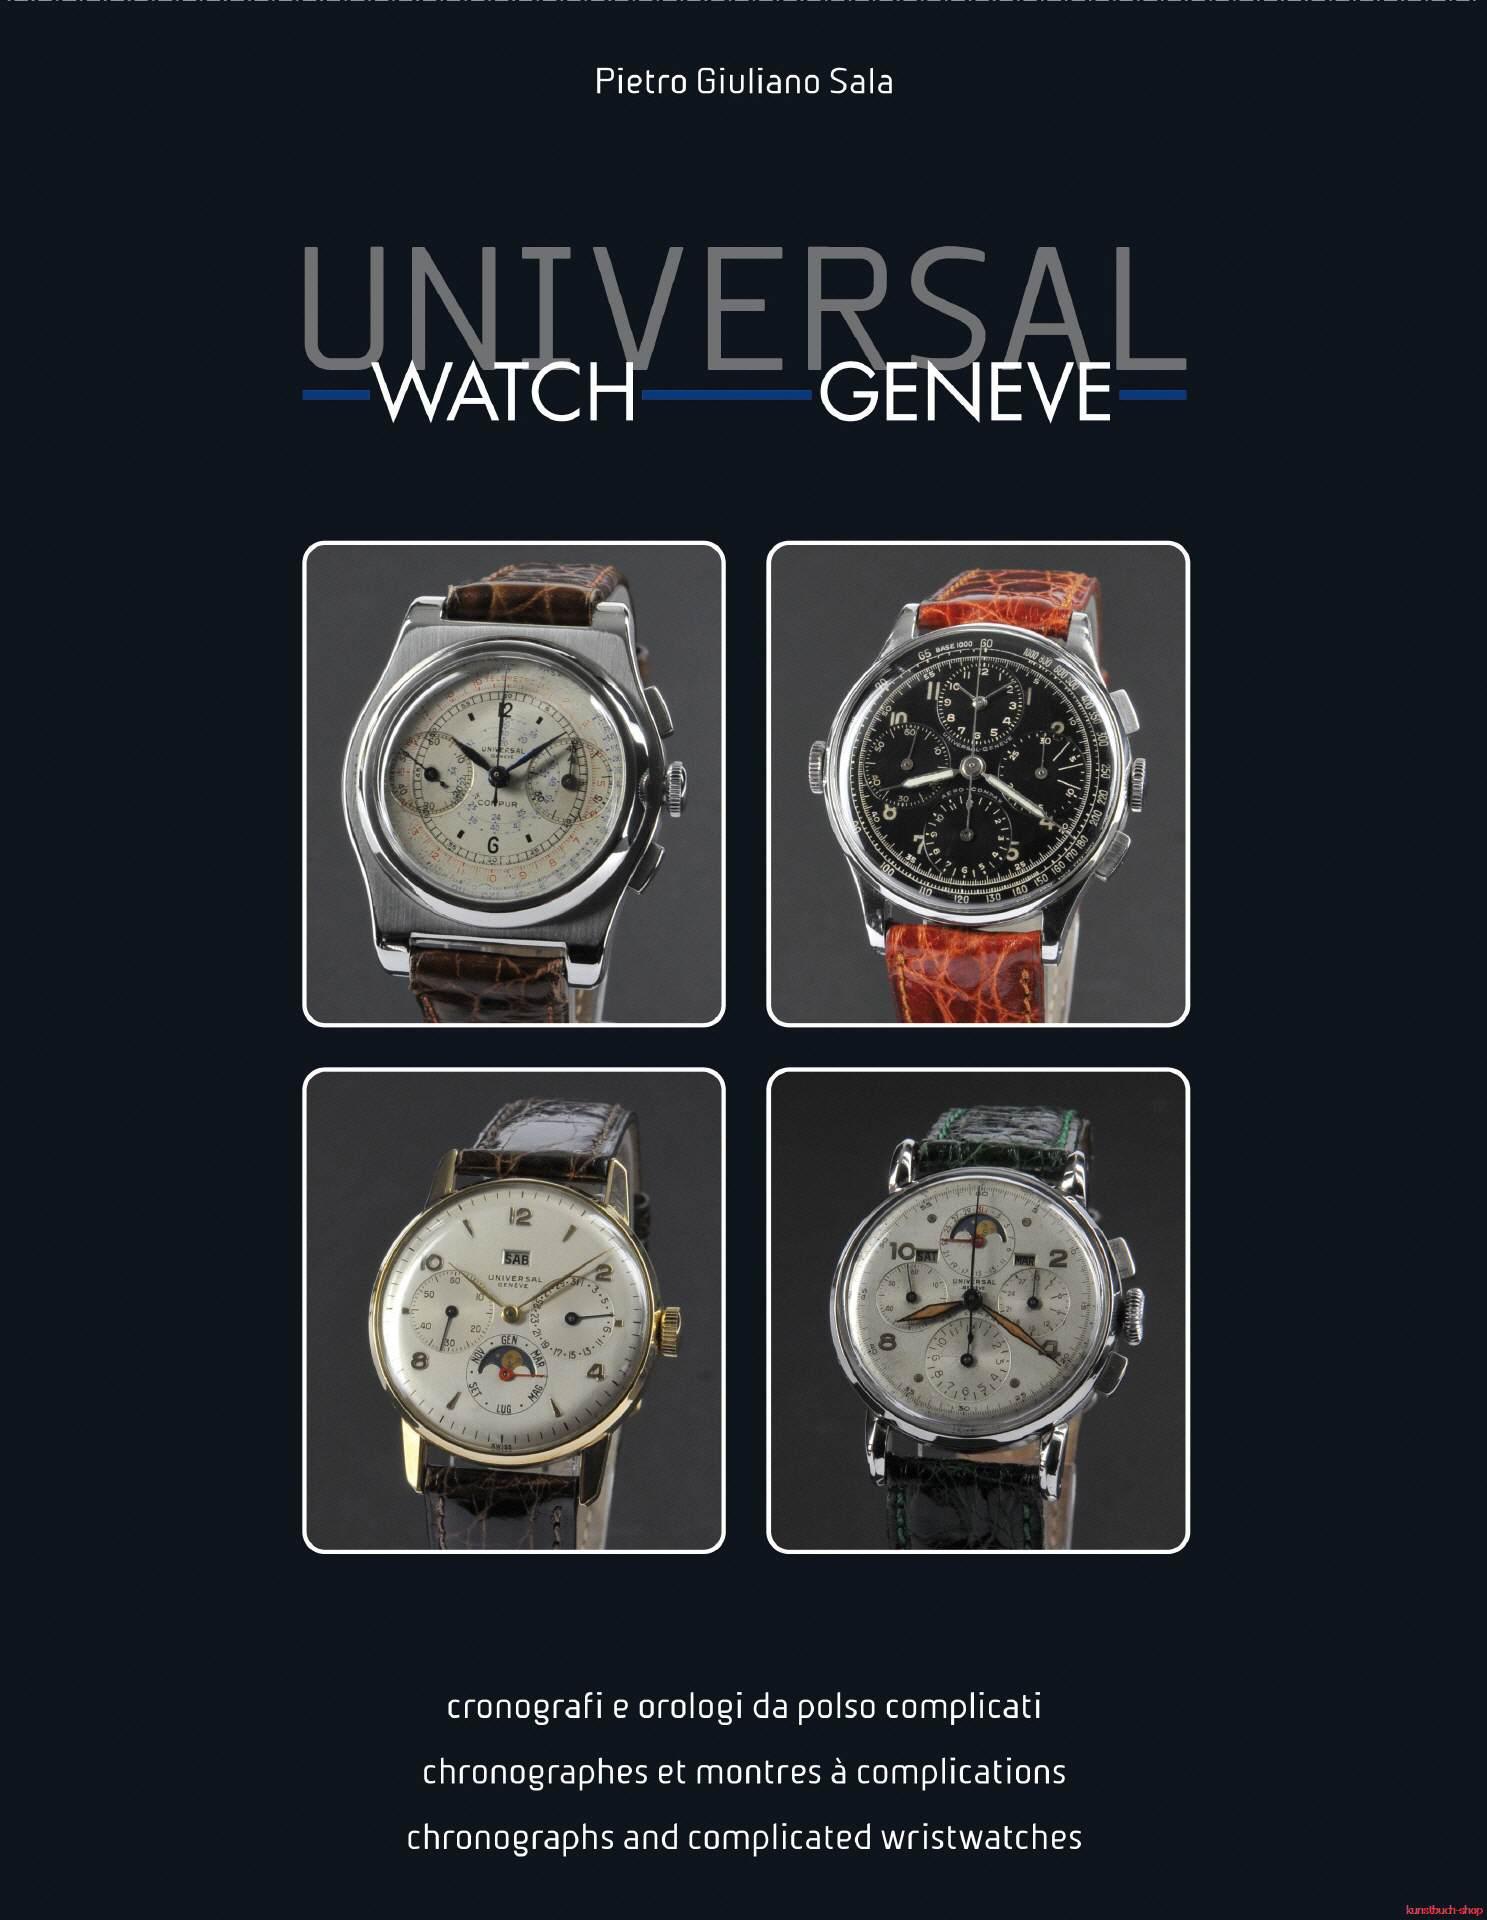 Universal Watch Genève - Pietro Giuliano Sala